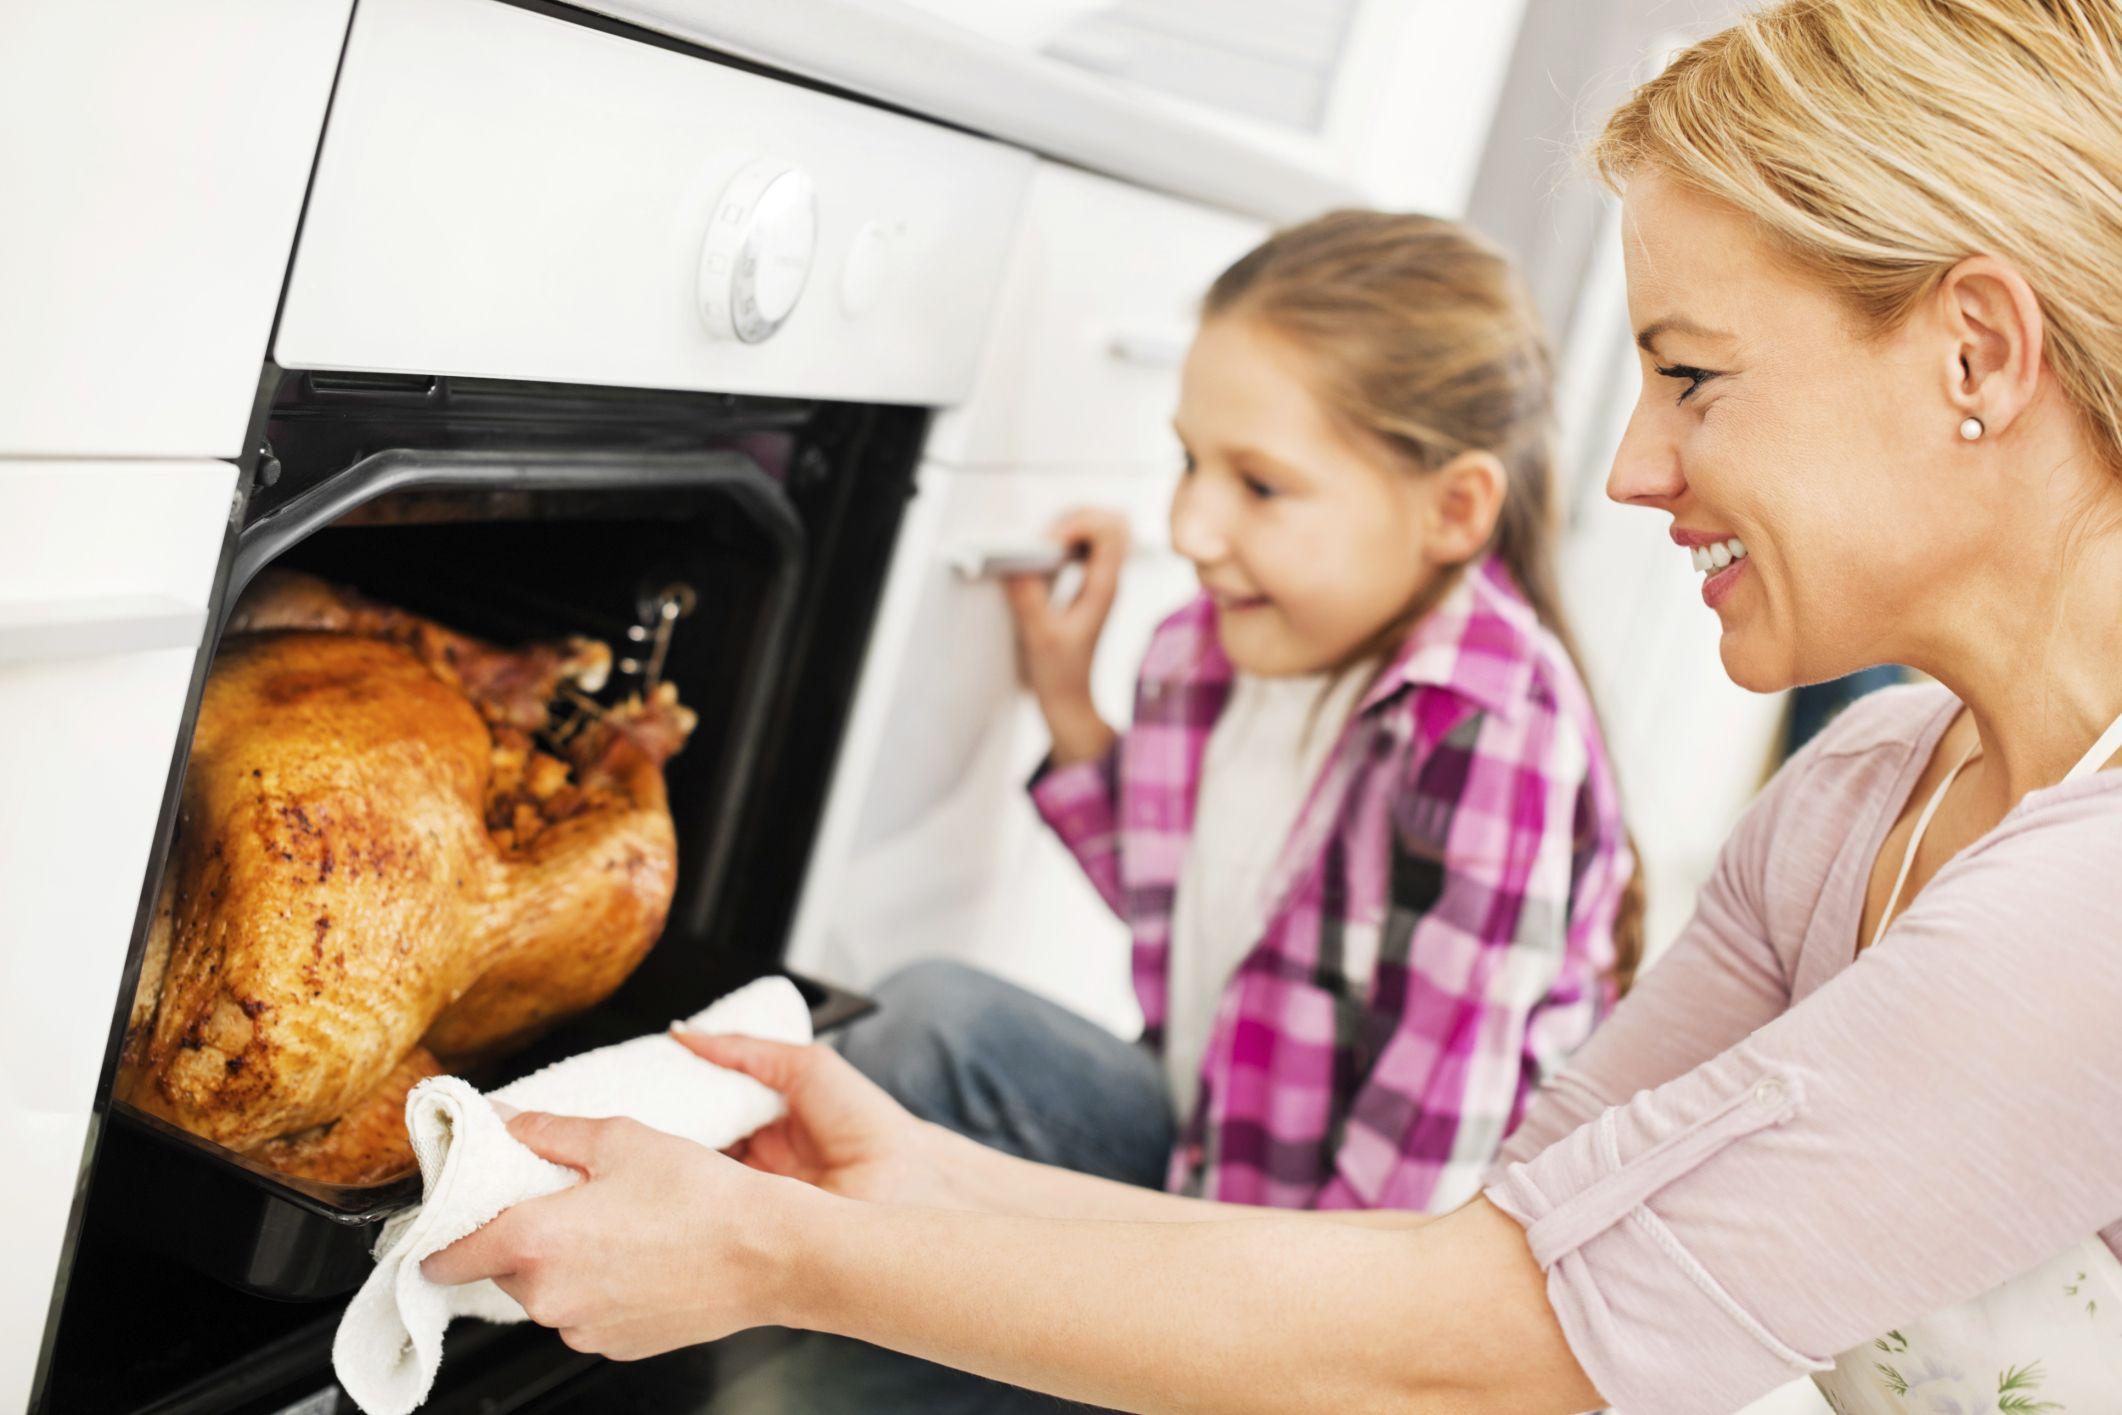 thanksgiving-cooking-kristian-sekulic-56a11c375f9b58b7d0bbcebc